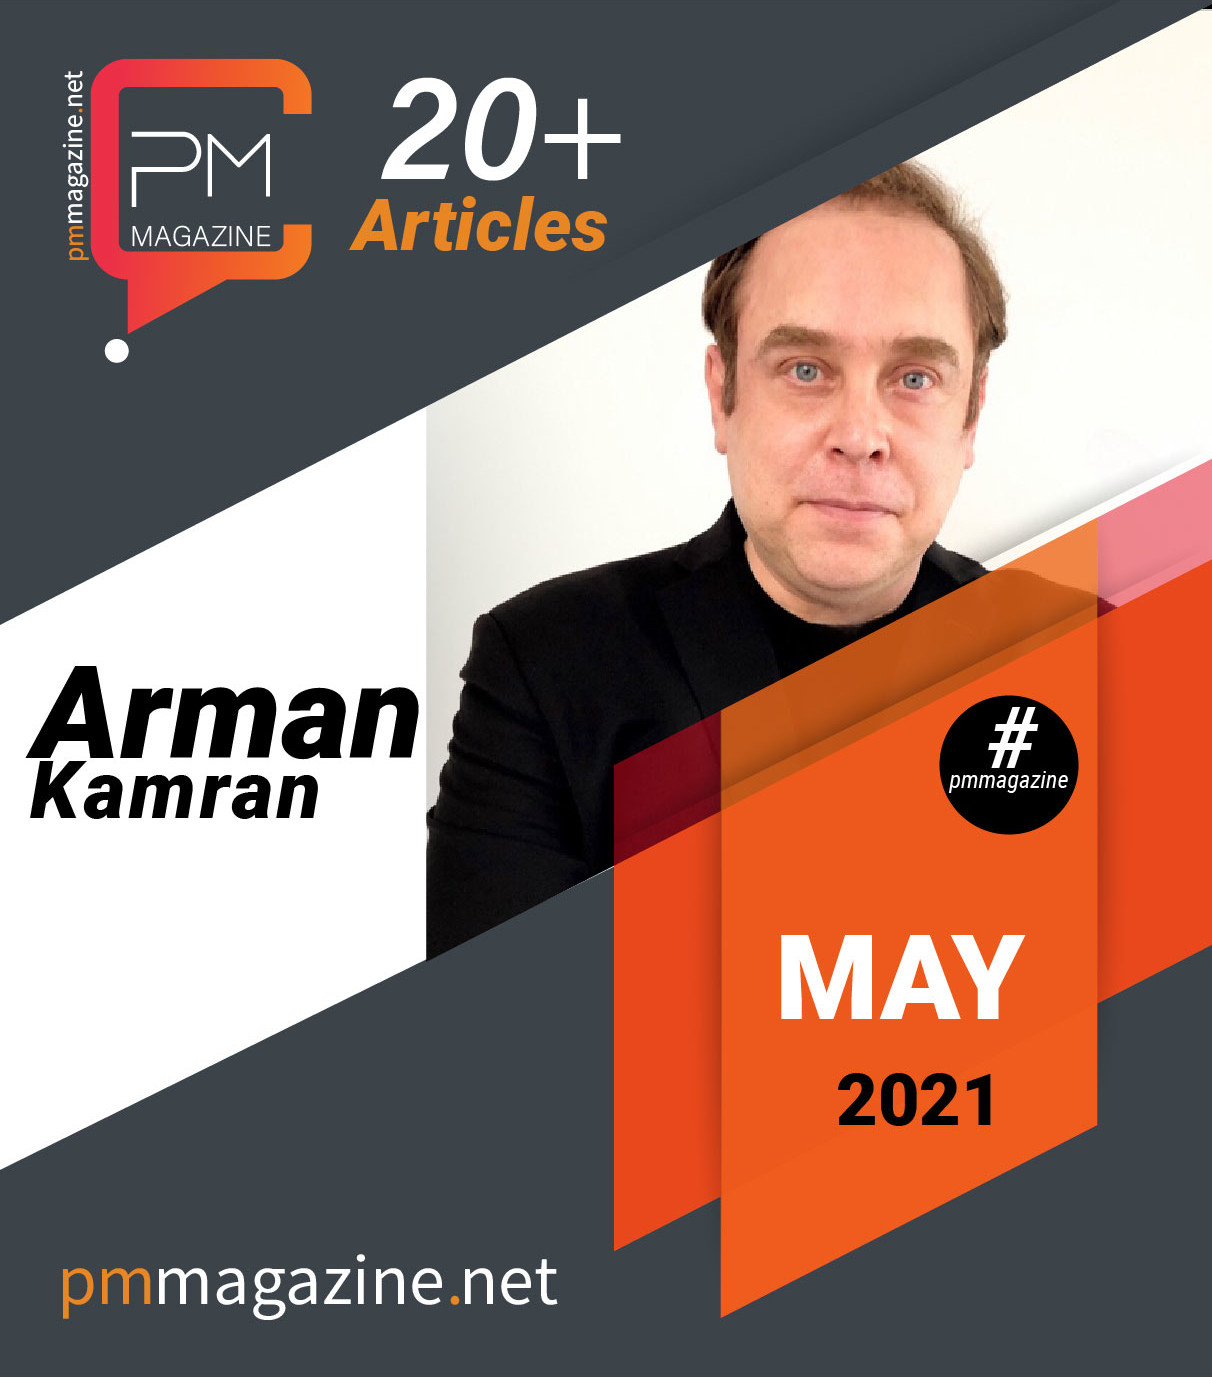 pmmagazine.net - Arman Kamran